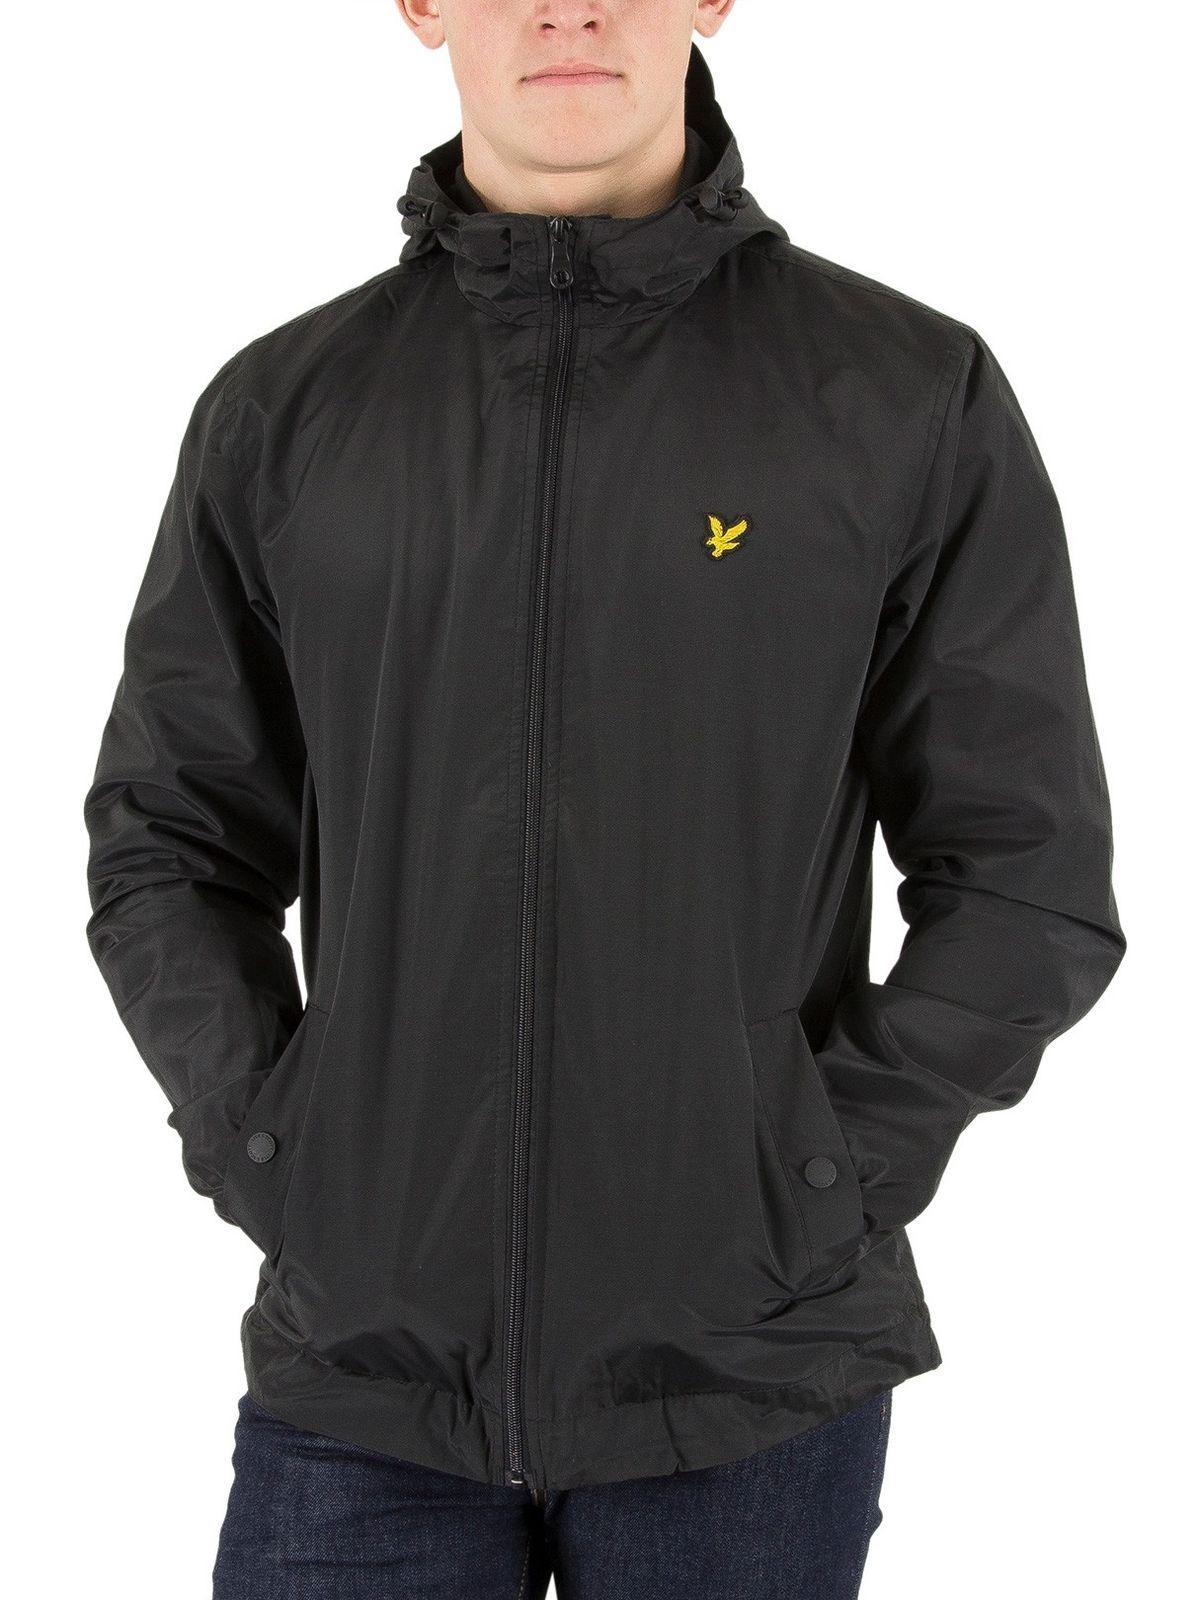 81 95 Lyle Scott Men S Zip Through Hooded Jacket Black Lyle Scott Mens Through Hooded Jacket Black Trendy Jackets Hooded Jacket Black Zip Ups [ 1600 x 1200 Pixel ]